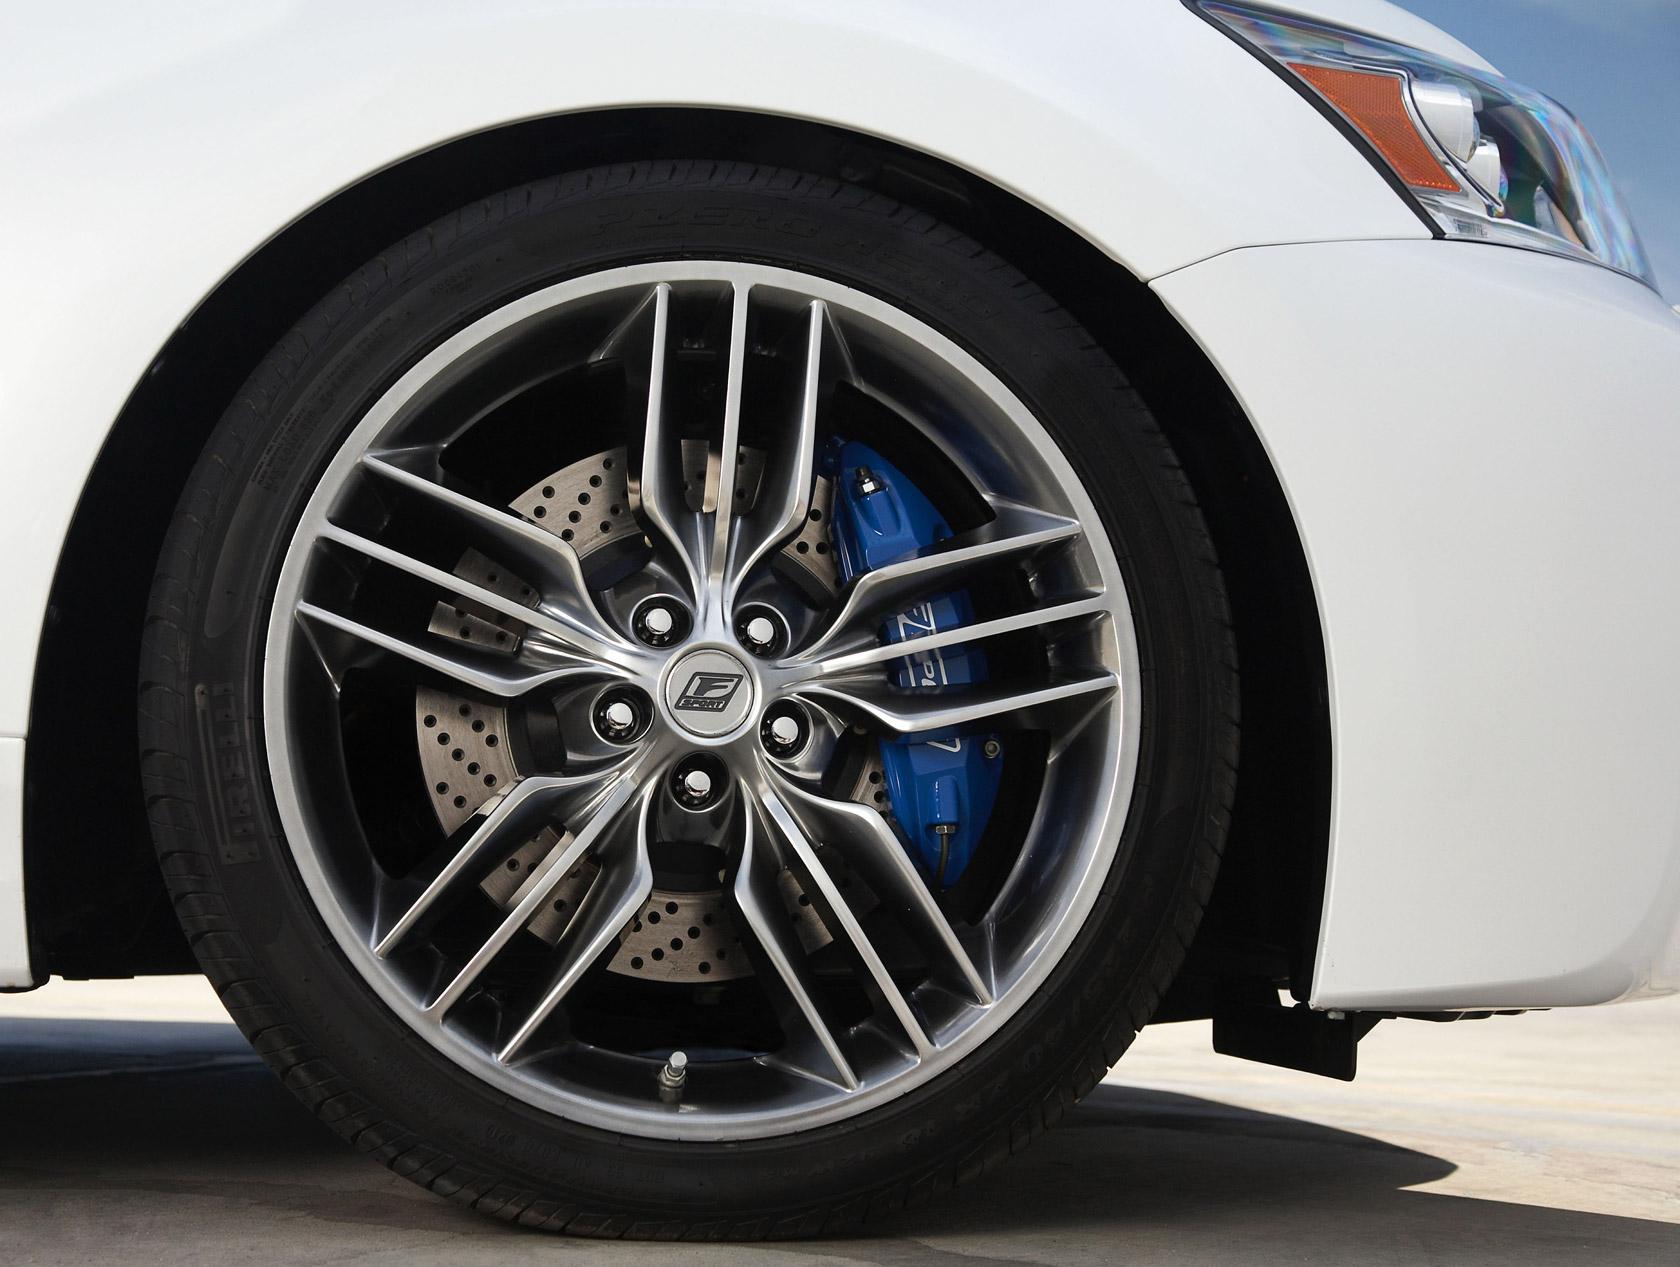 Ct200h F Sport >> CT 200h SEMA F-sport - ClubLexus - Lexus Forum Discussion